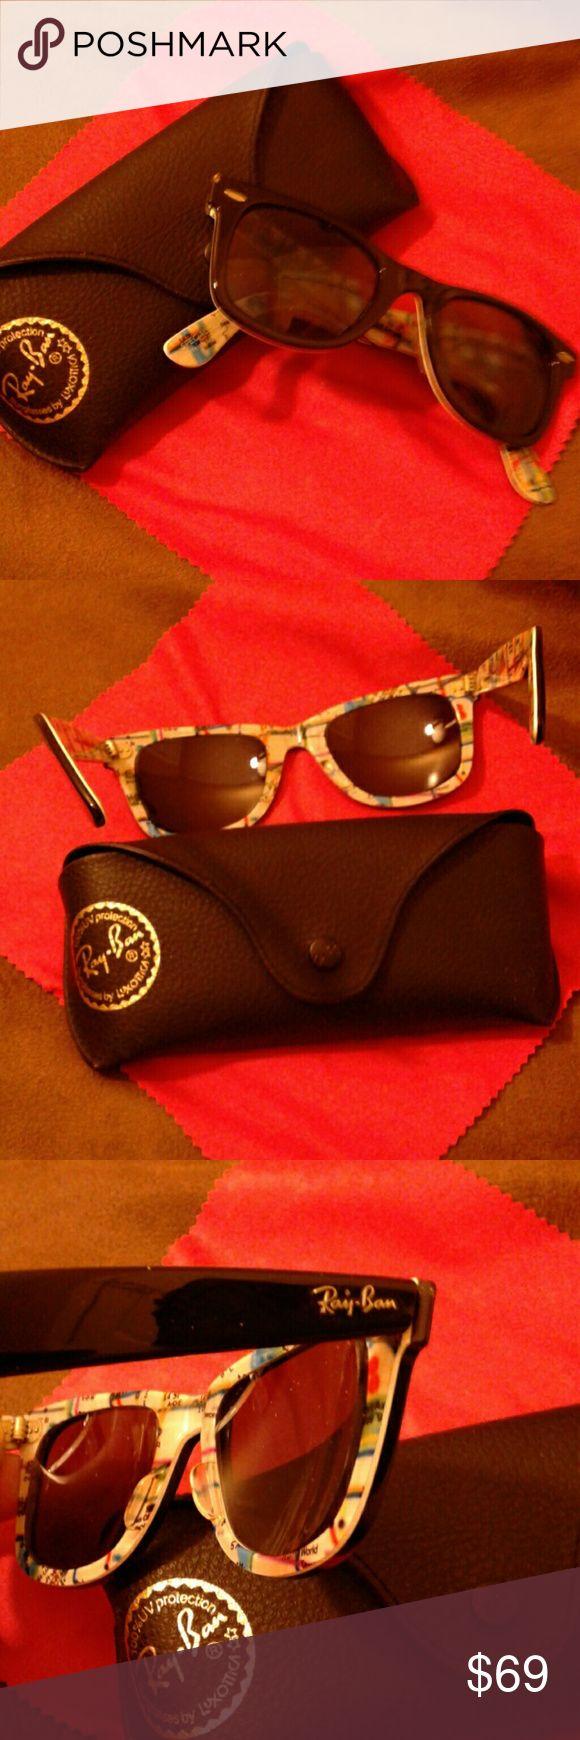 Ray - Ban Prescription Sunglasses Just needs your prescription lenses. Special Series #2. Ray-Ban Accessories Sunglasses